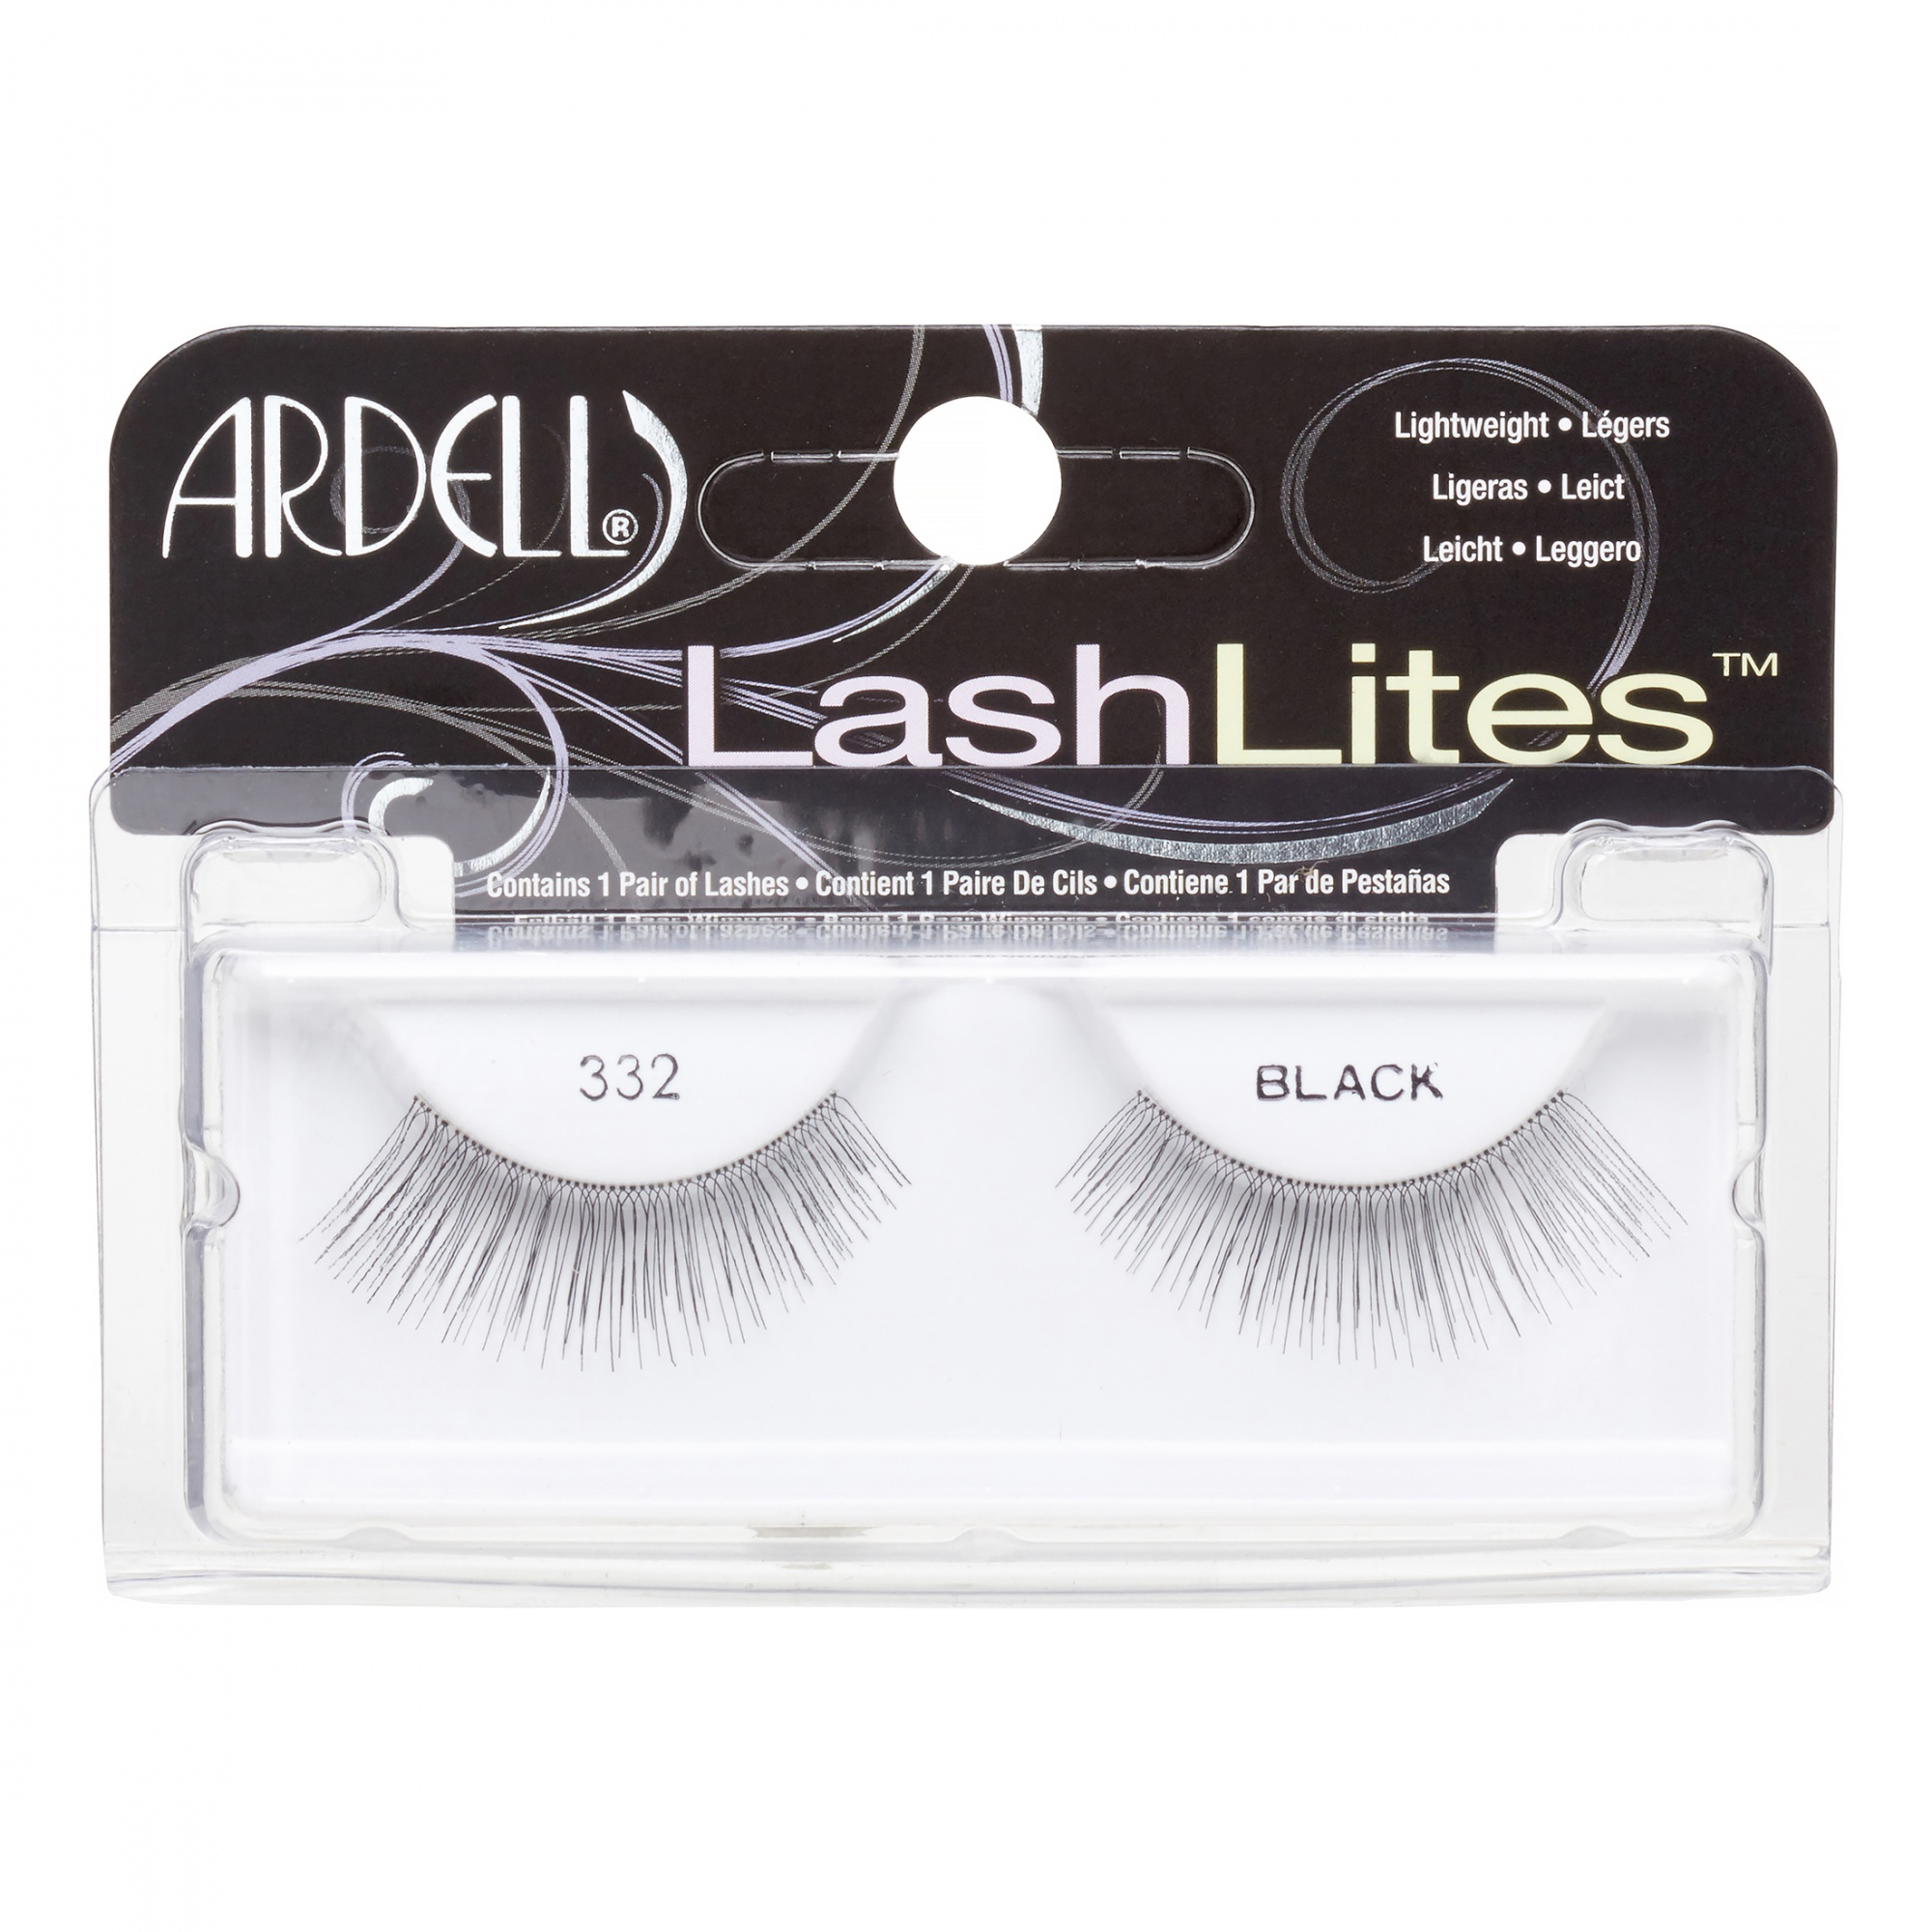 2c2743c134c Andrea LashLite Lash, # 332 by Andrea - Shop Online for Beauty in ...